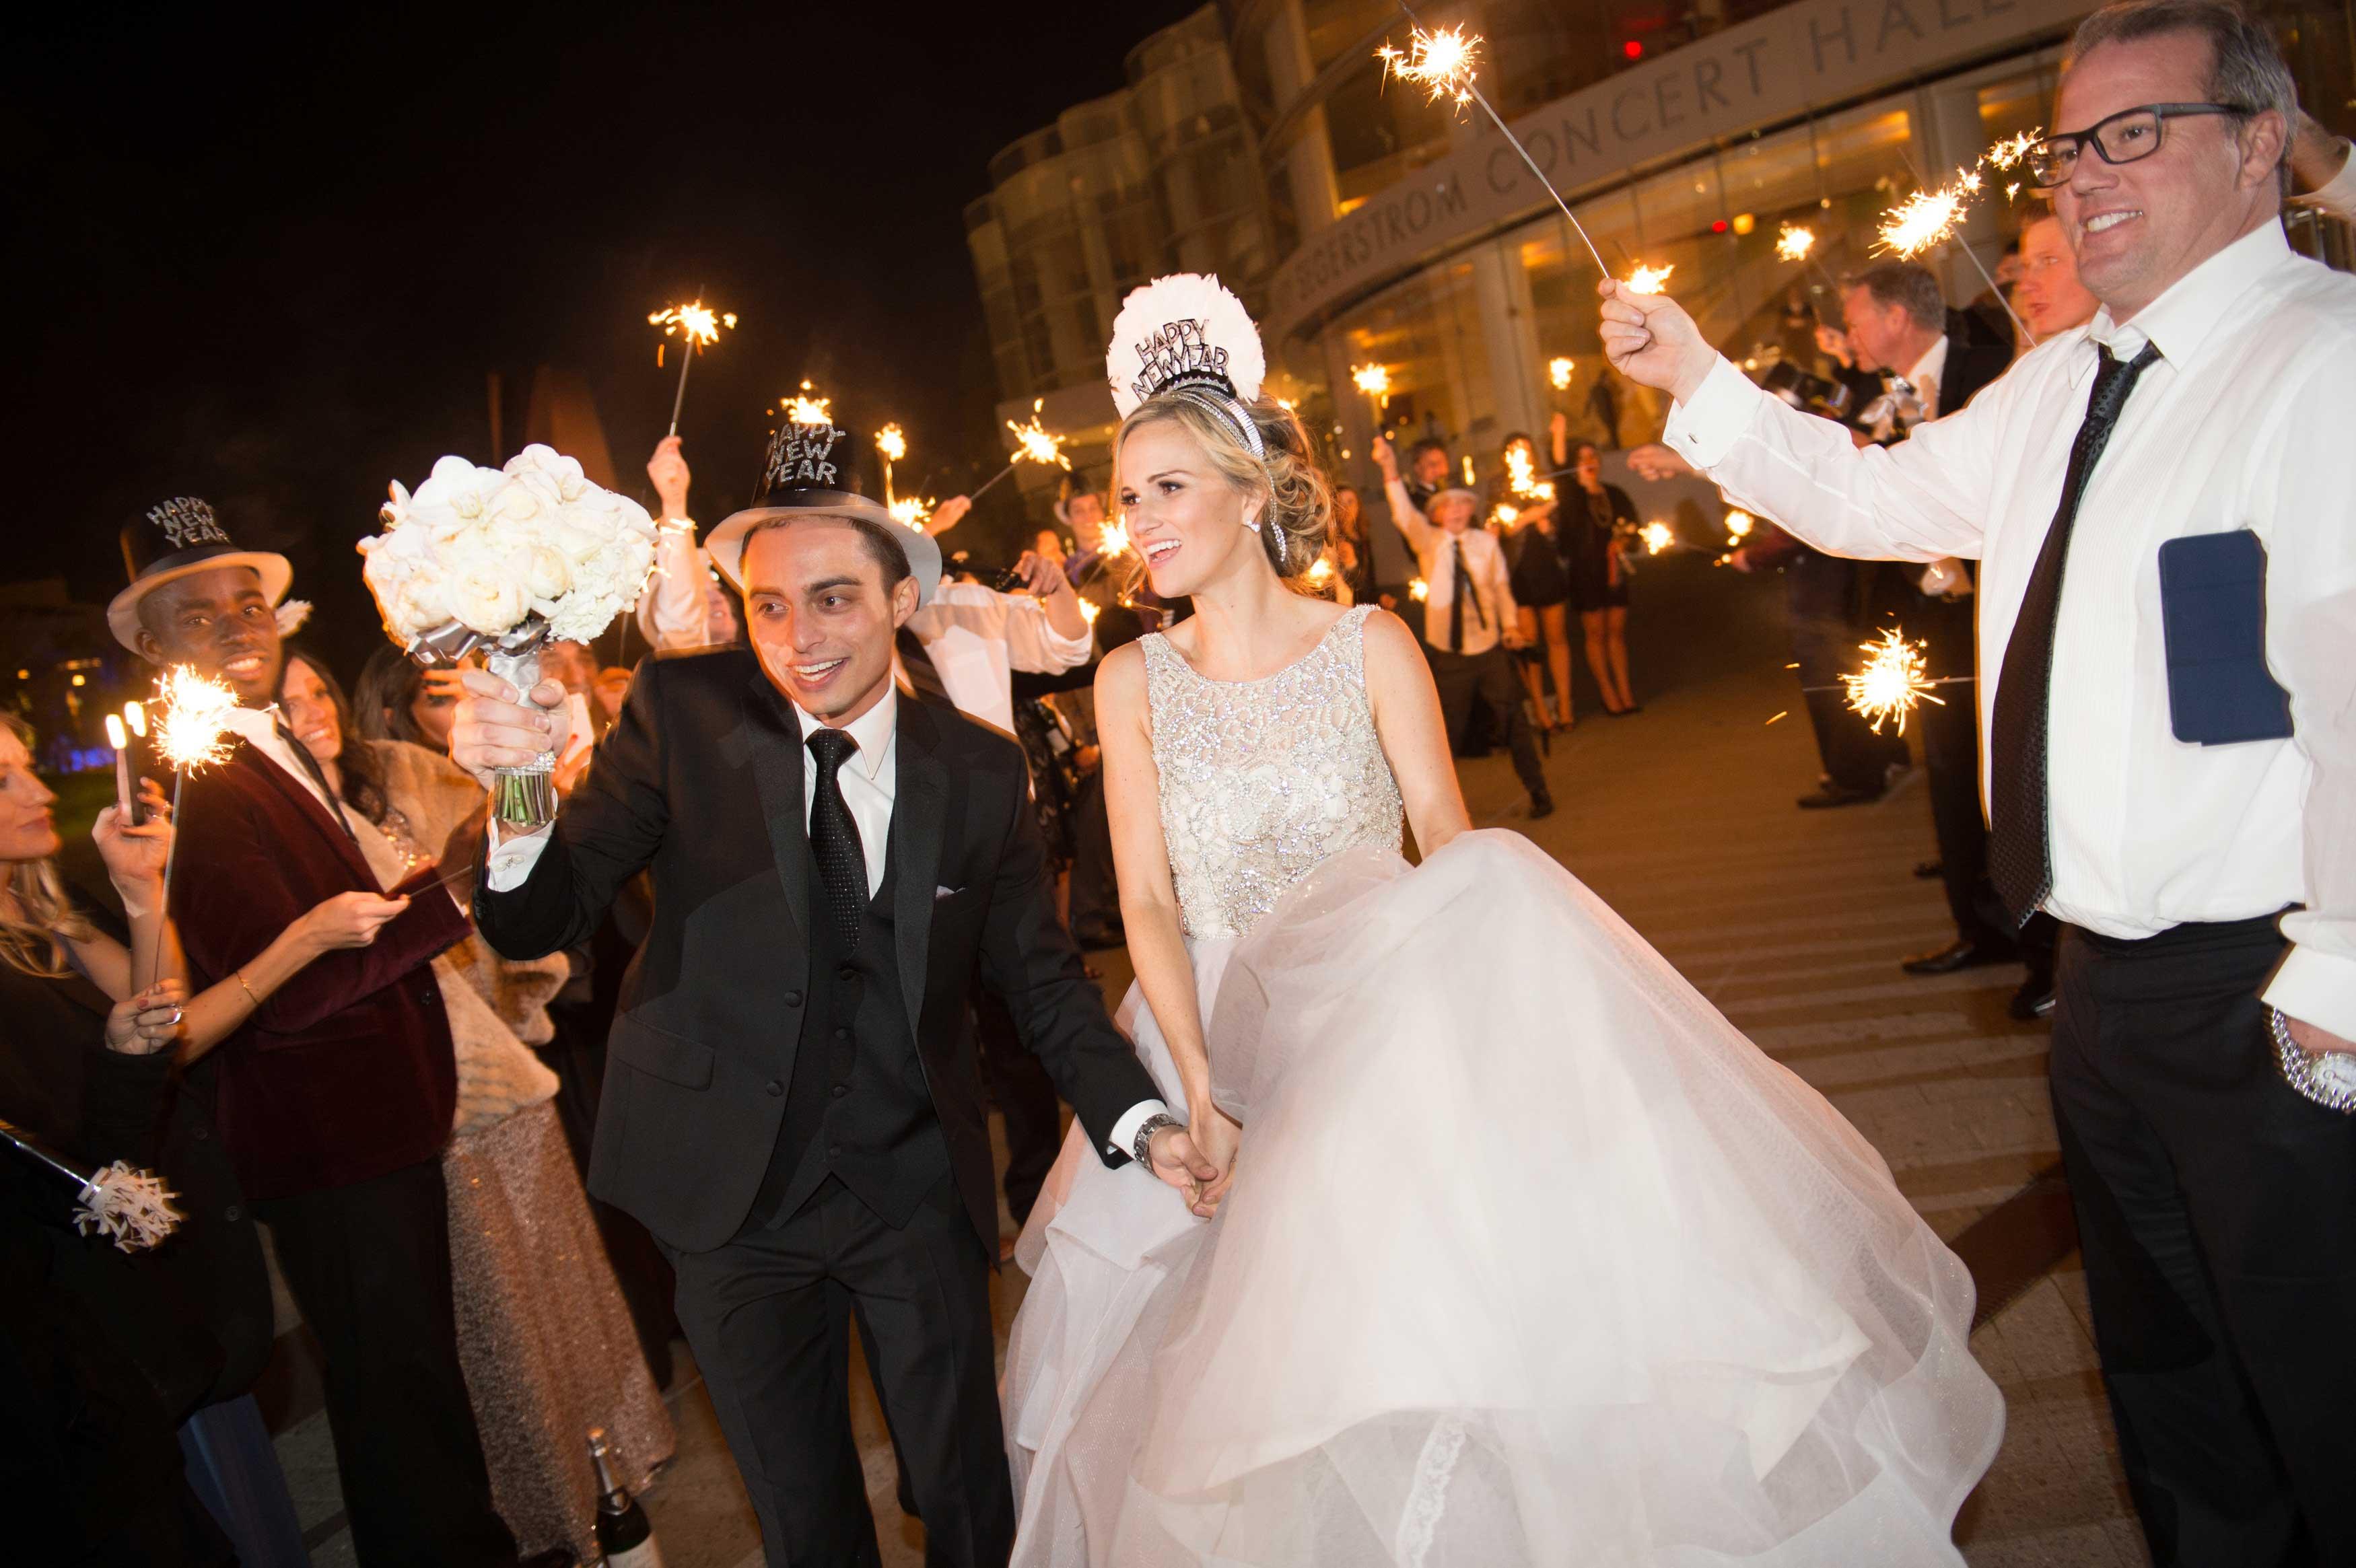 Bride And Groom In New Years Eve Tiara Hats Headbands Sparkler Exit